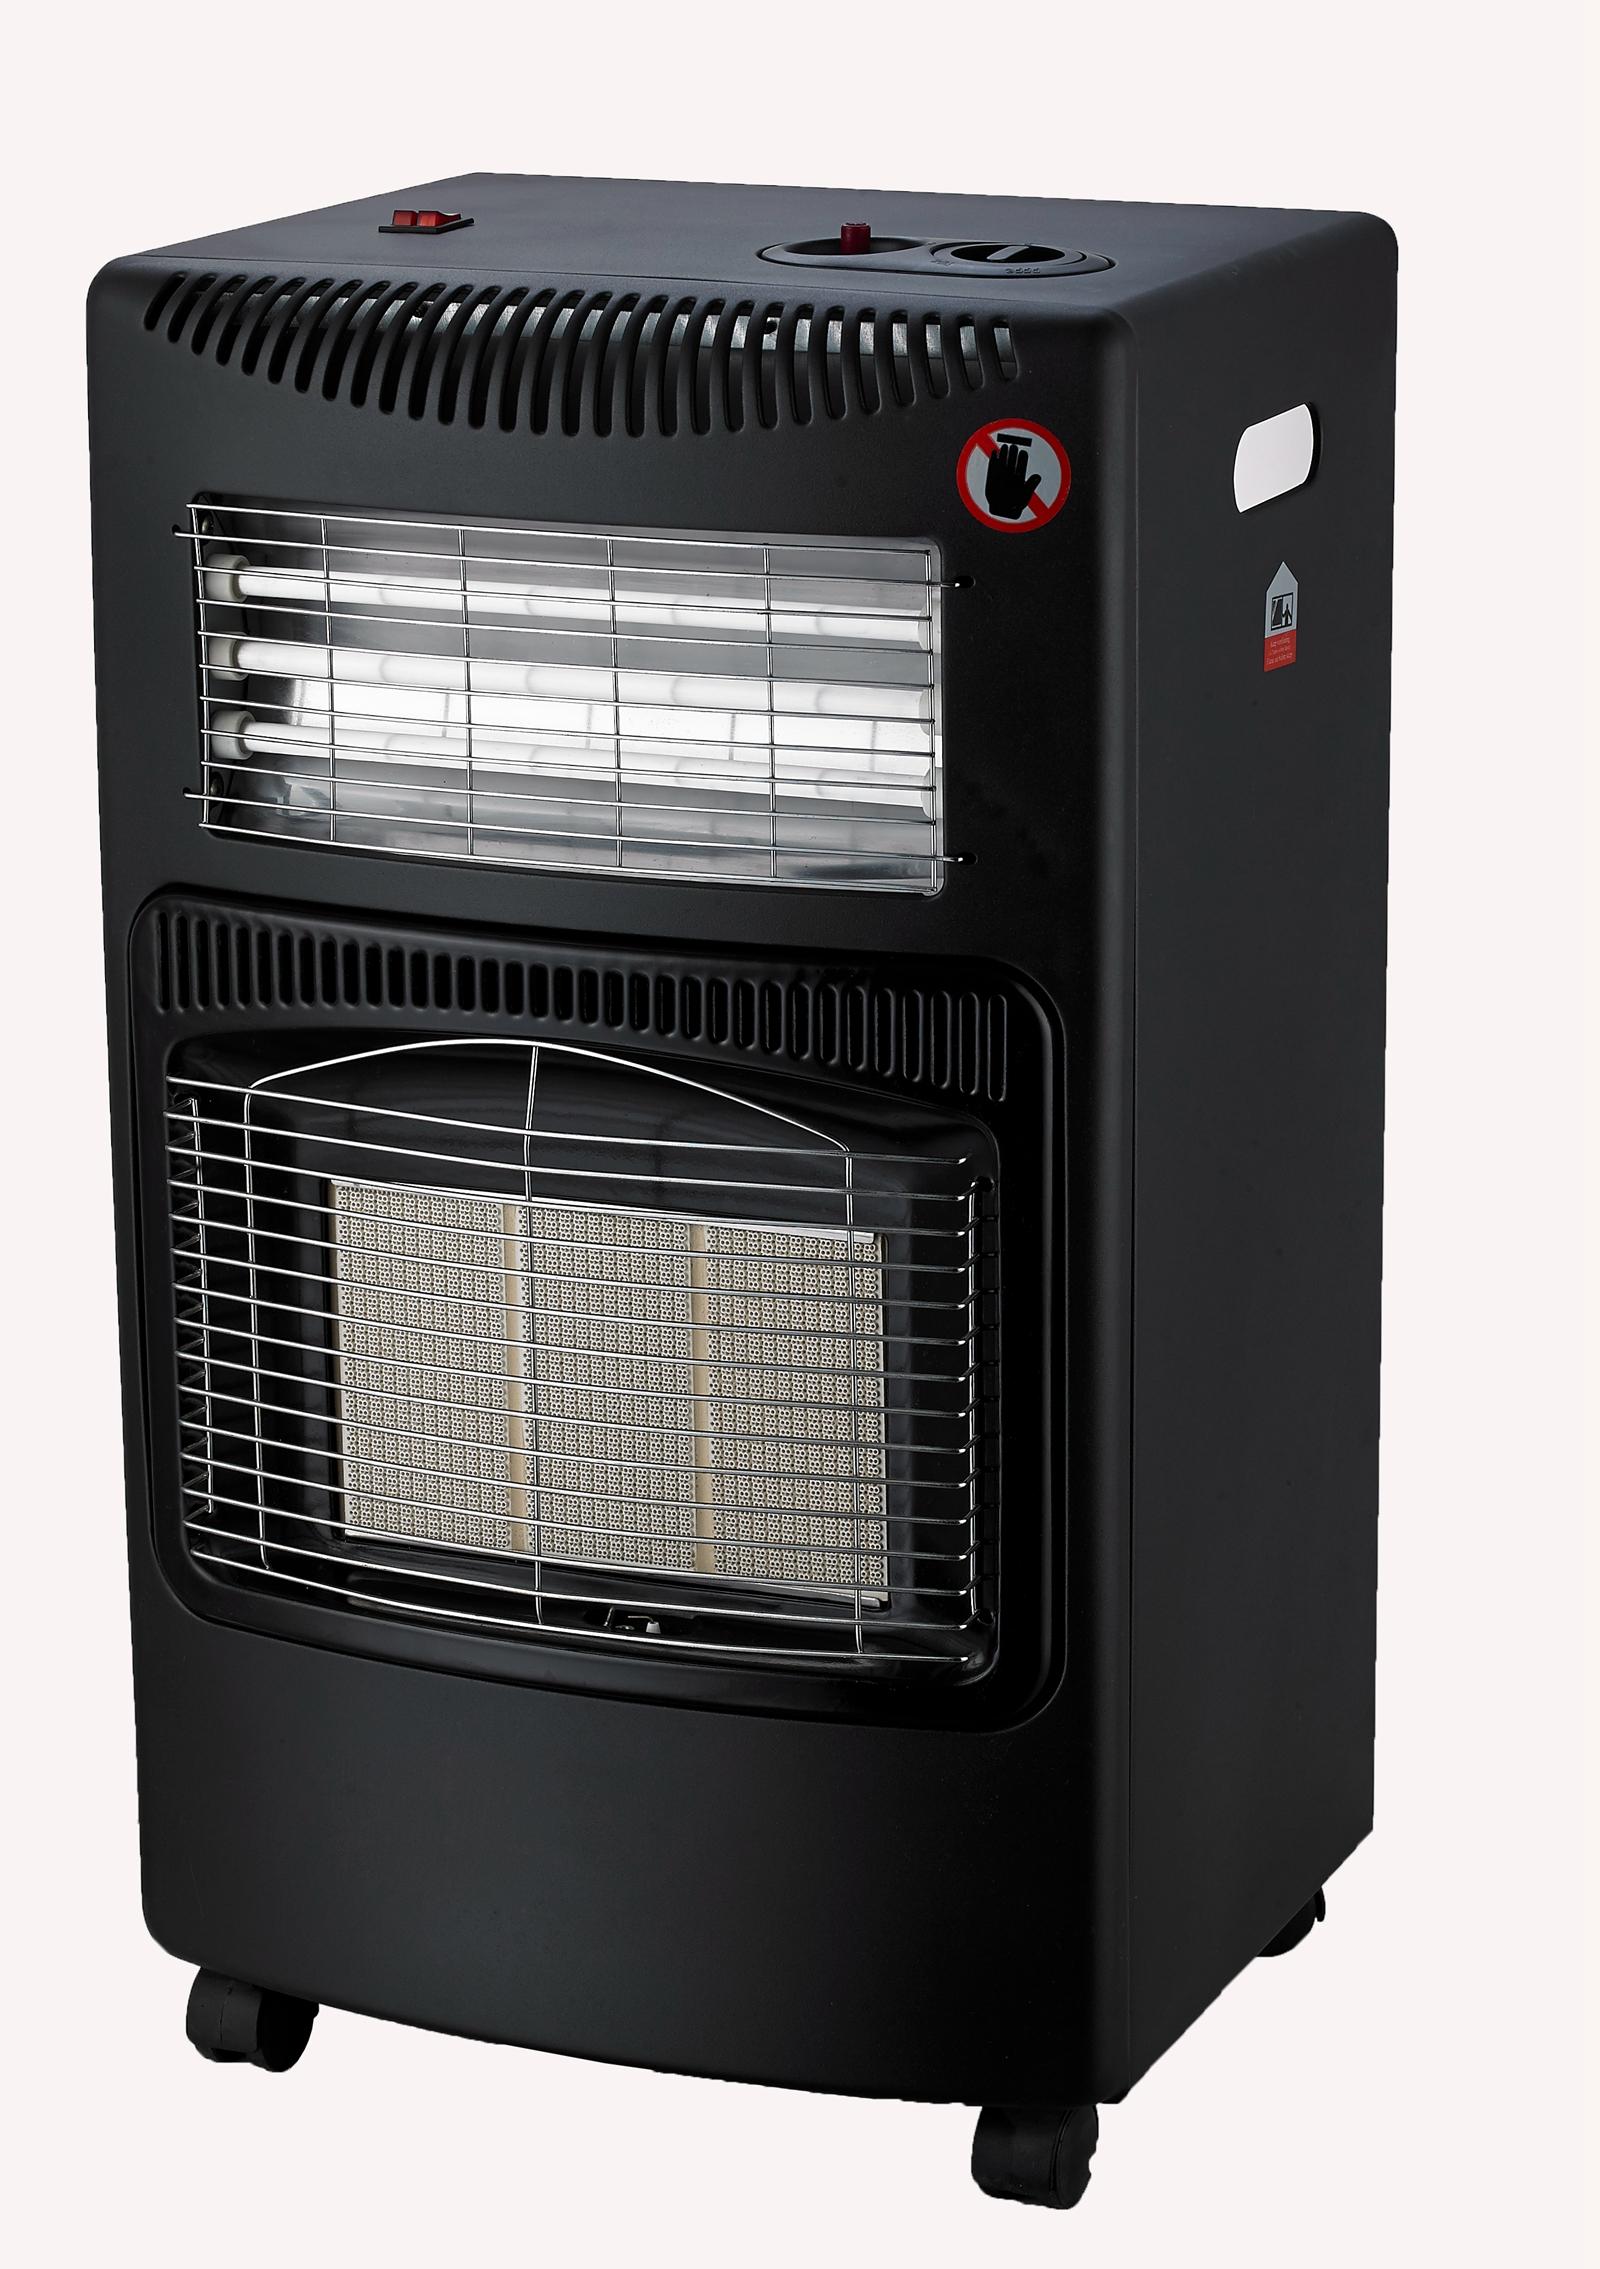 Portable Home Butane Fire Calor Gas Electric Cabinet Heater New eBay #791F21